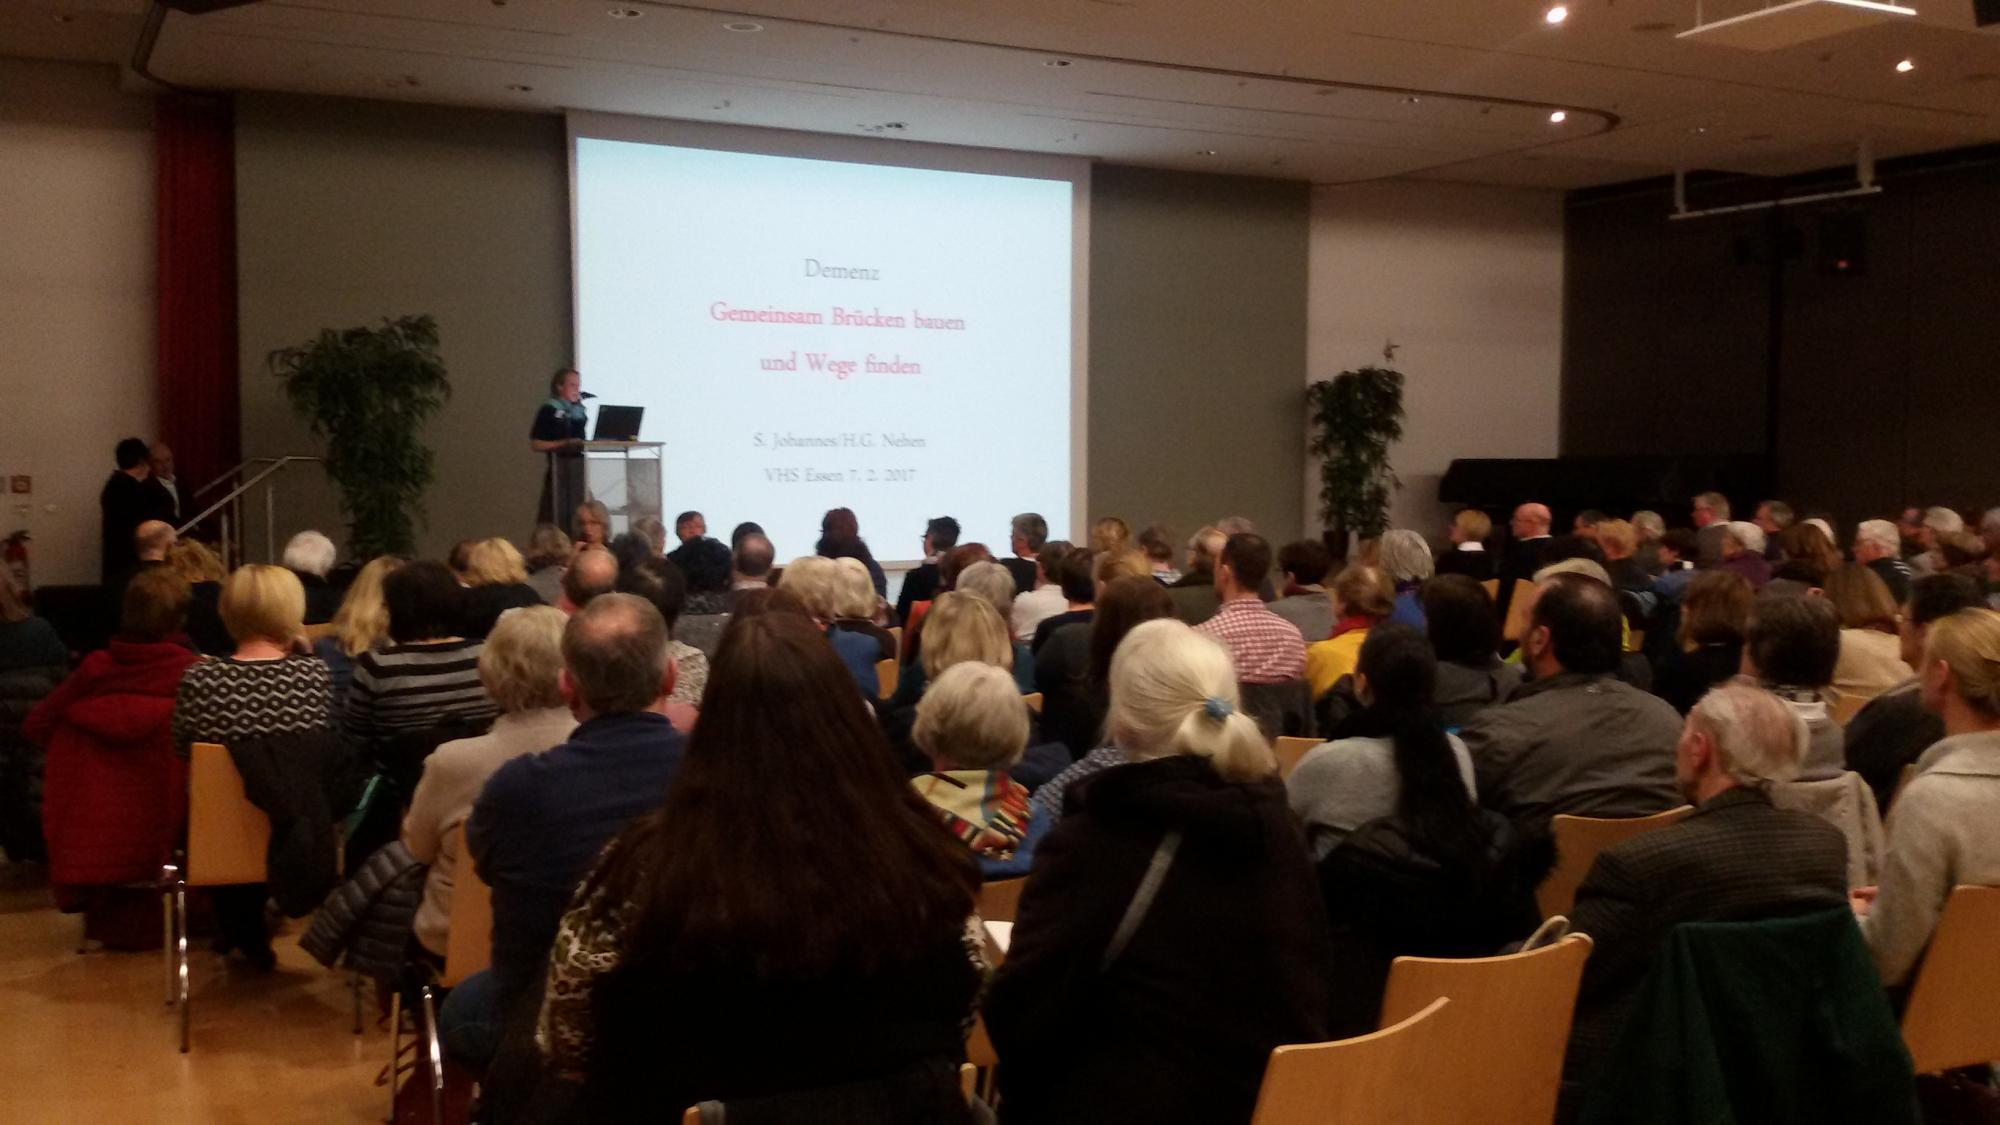 Begrüßung durch Verena Krekeler / Demenz-Servicezentrum Westl. Ruhrgebiet